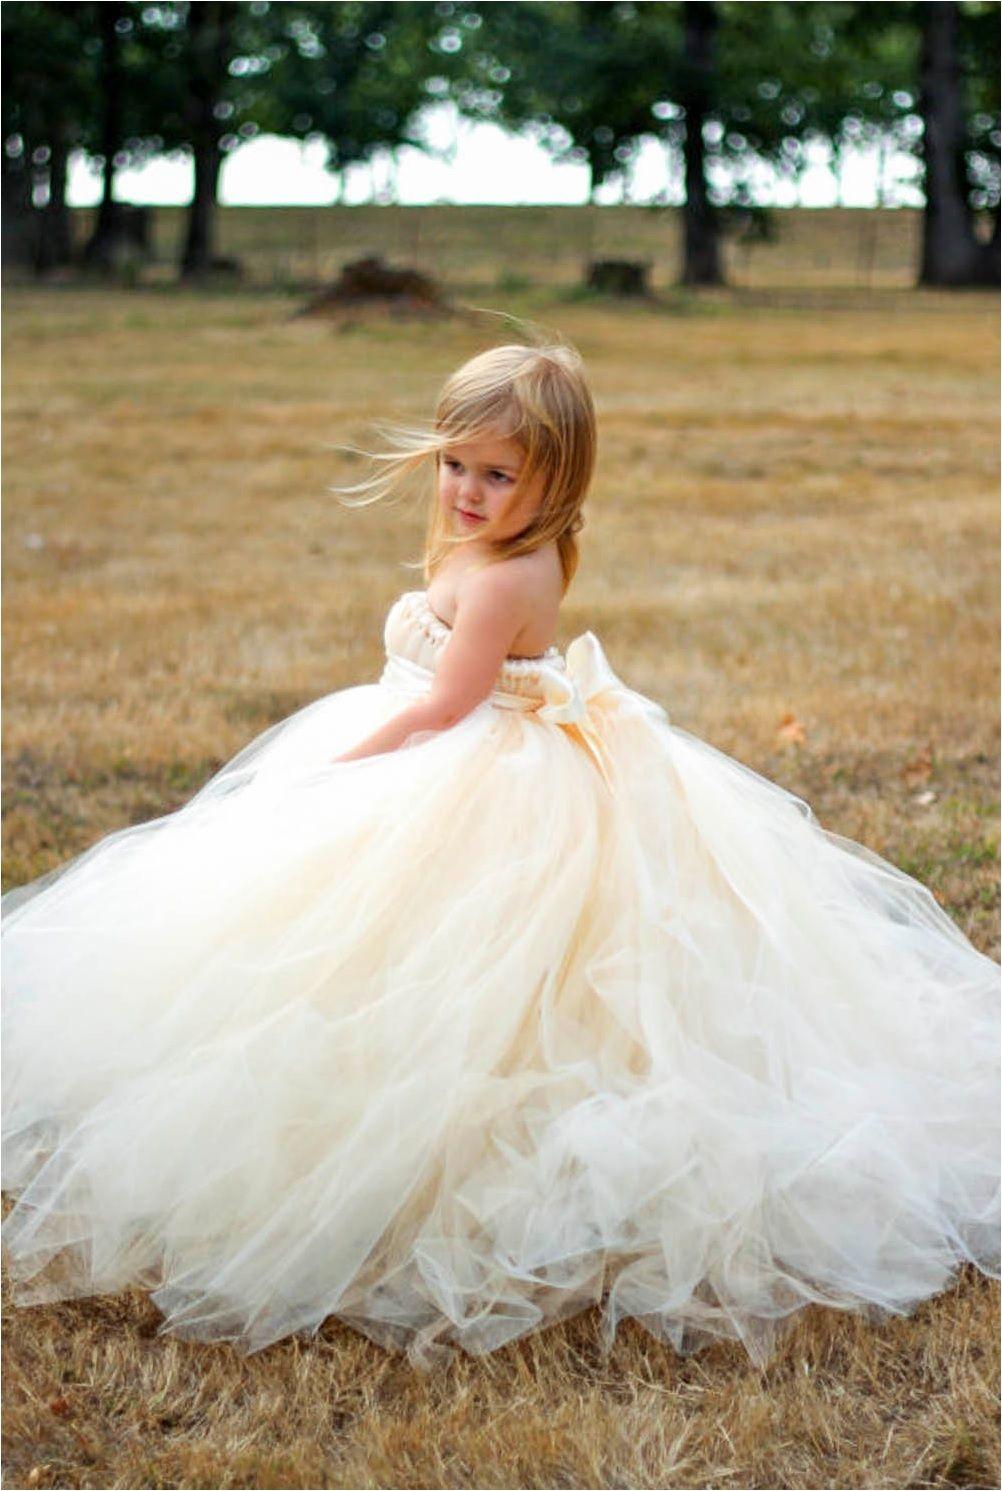 Bruidsmeisjes jurken bij dressmatch kleding pinterest wedding